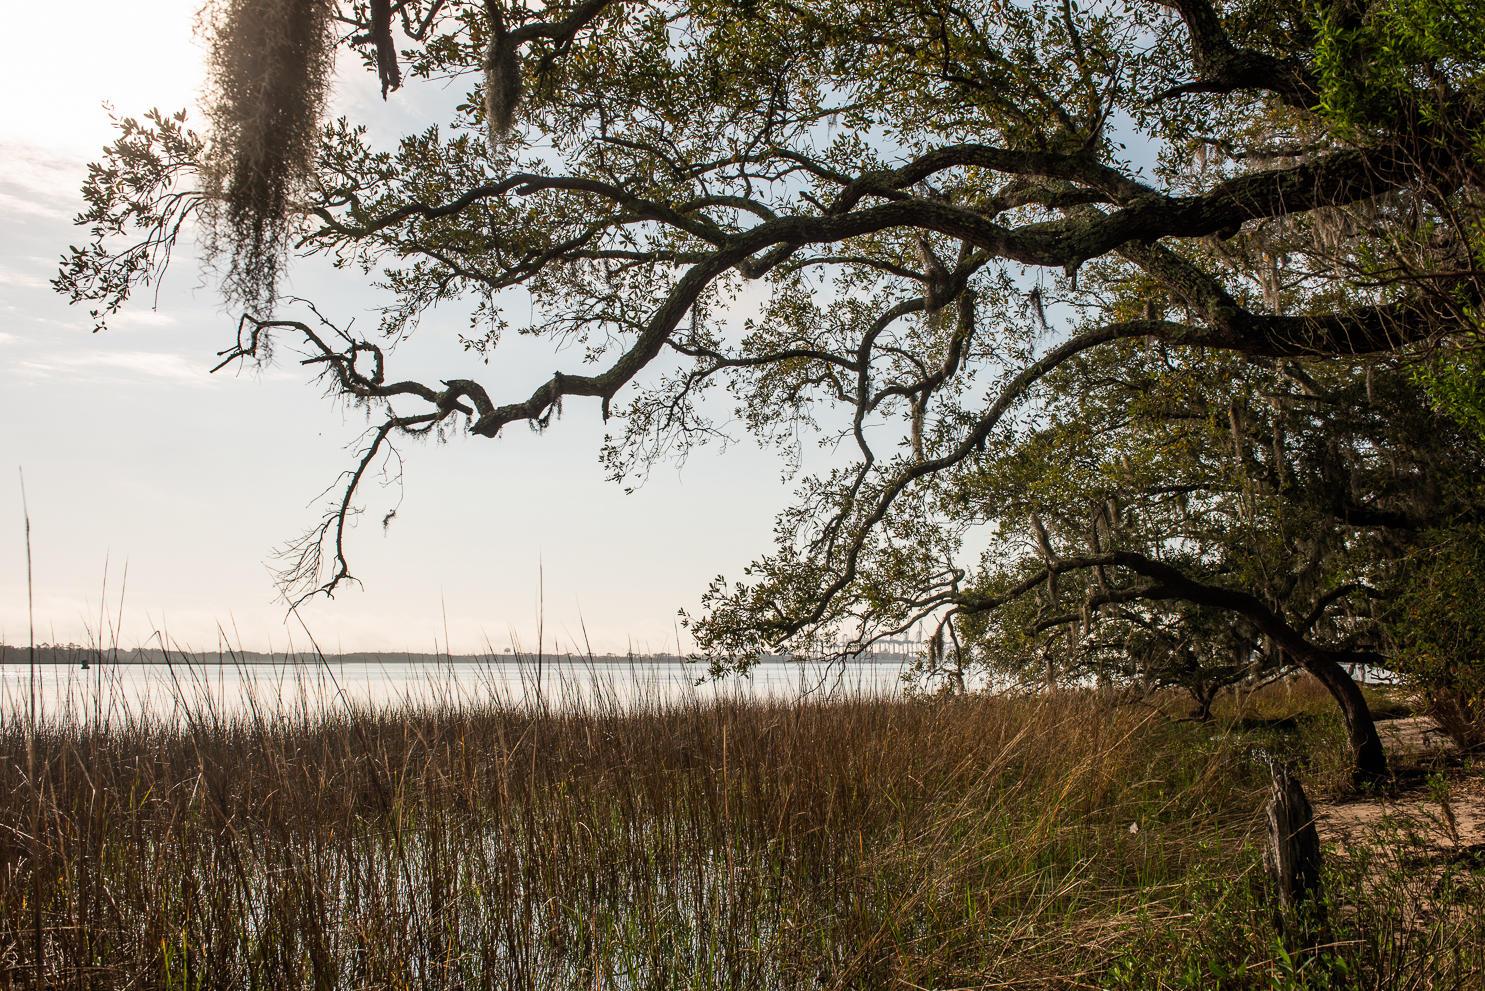 Daniel Landing Condos Homes For Sale - 130 River Landing, Charleston, SC - 7